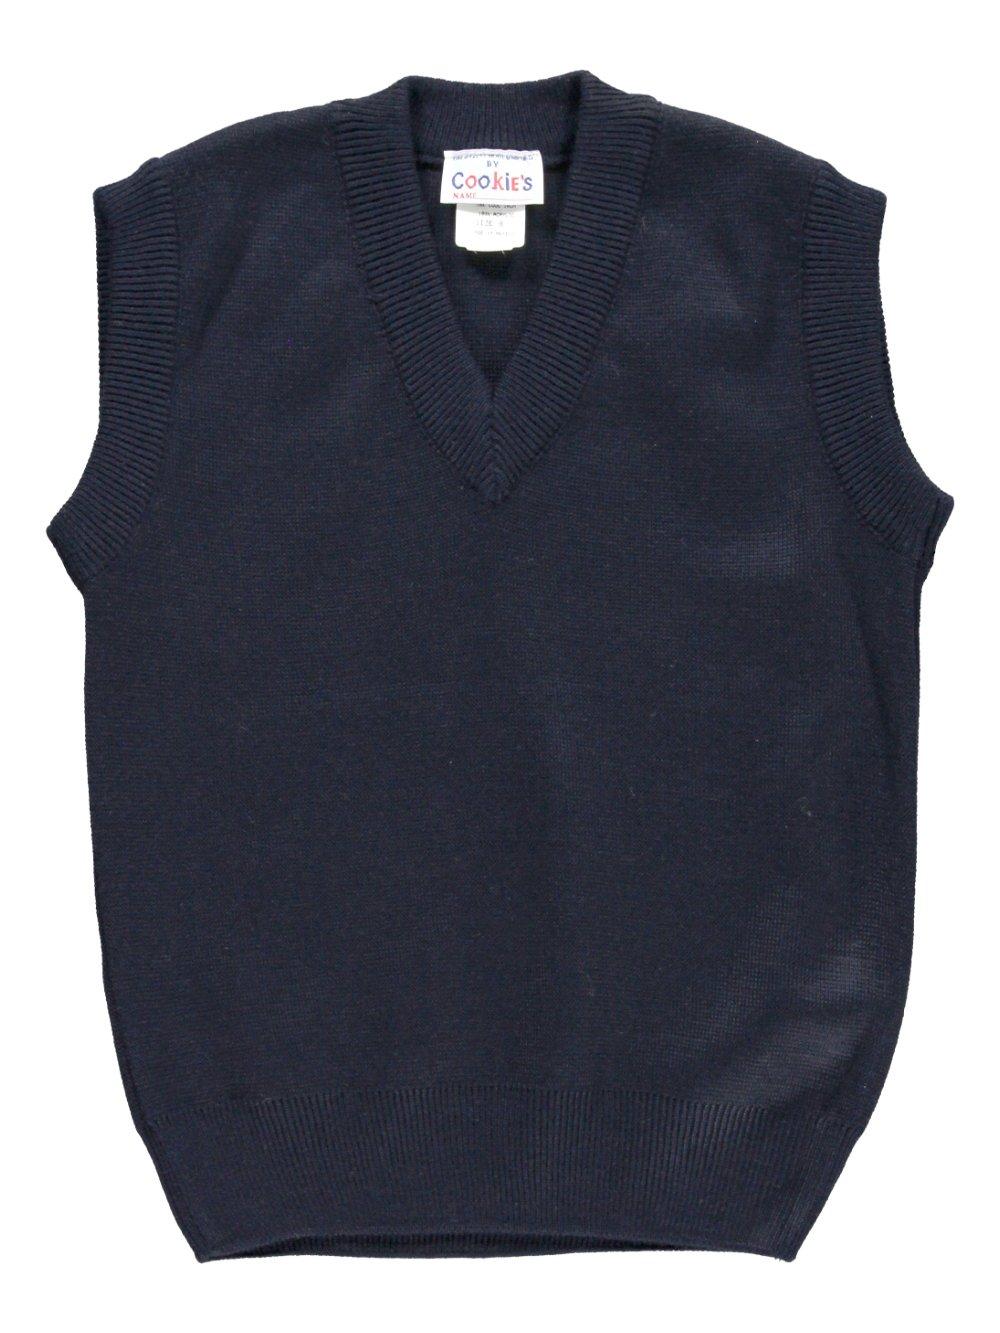 Cookie's Brand V-Neck Unisex Sweater Vest - navy, 8